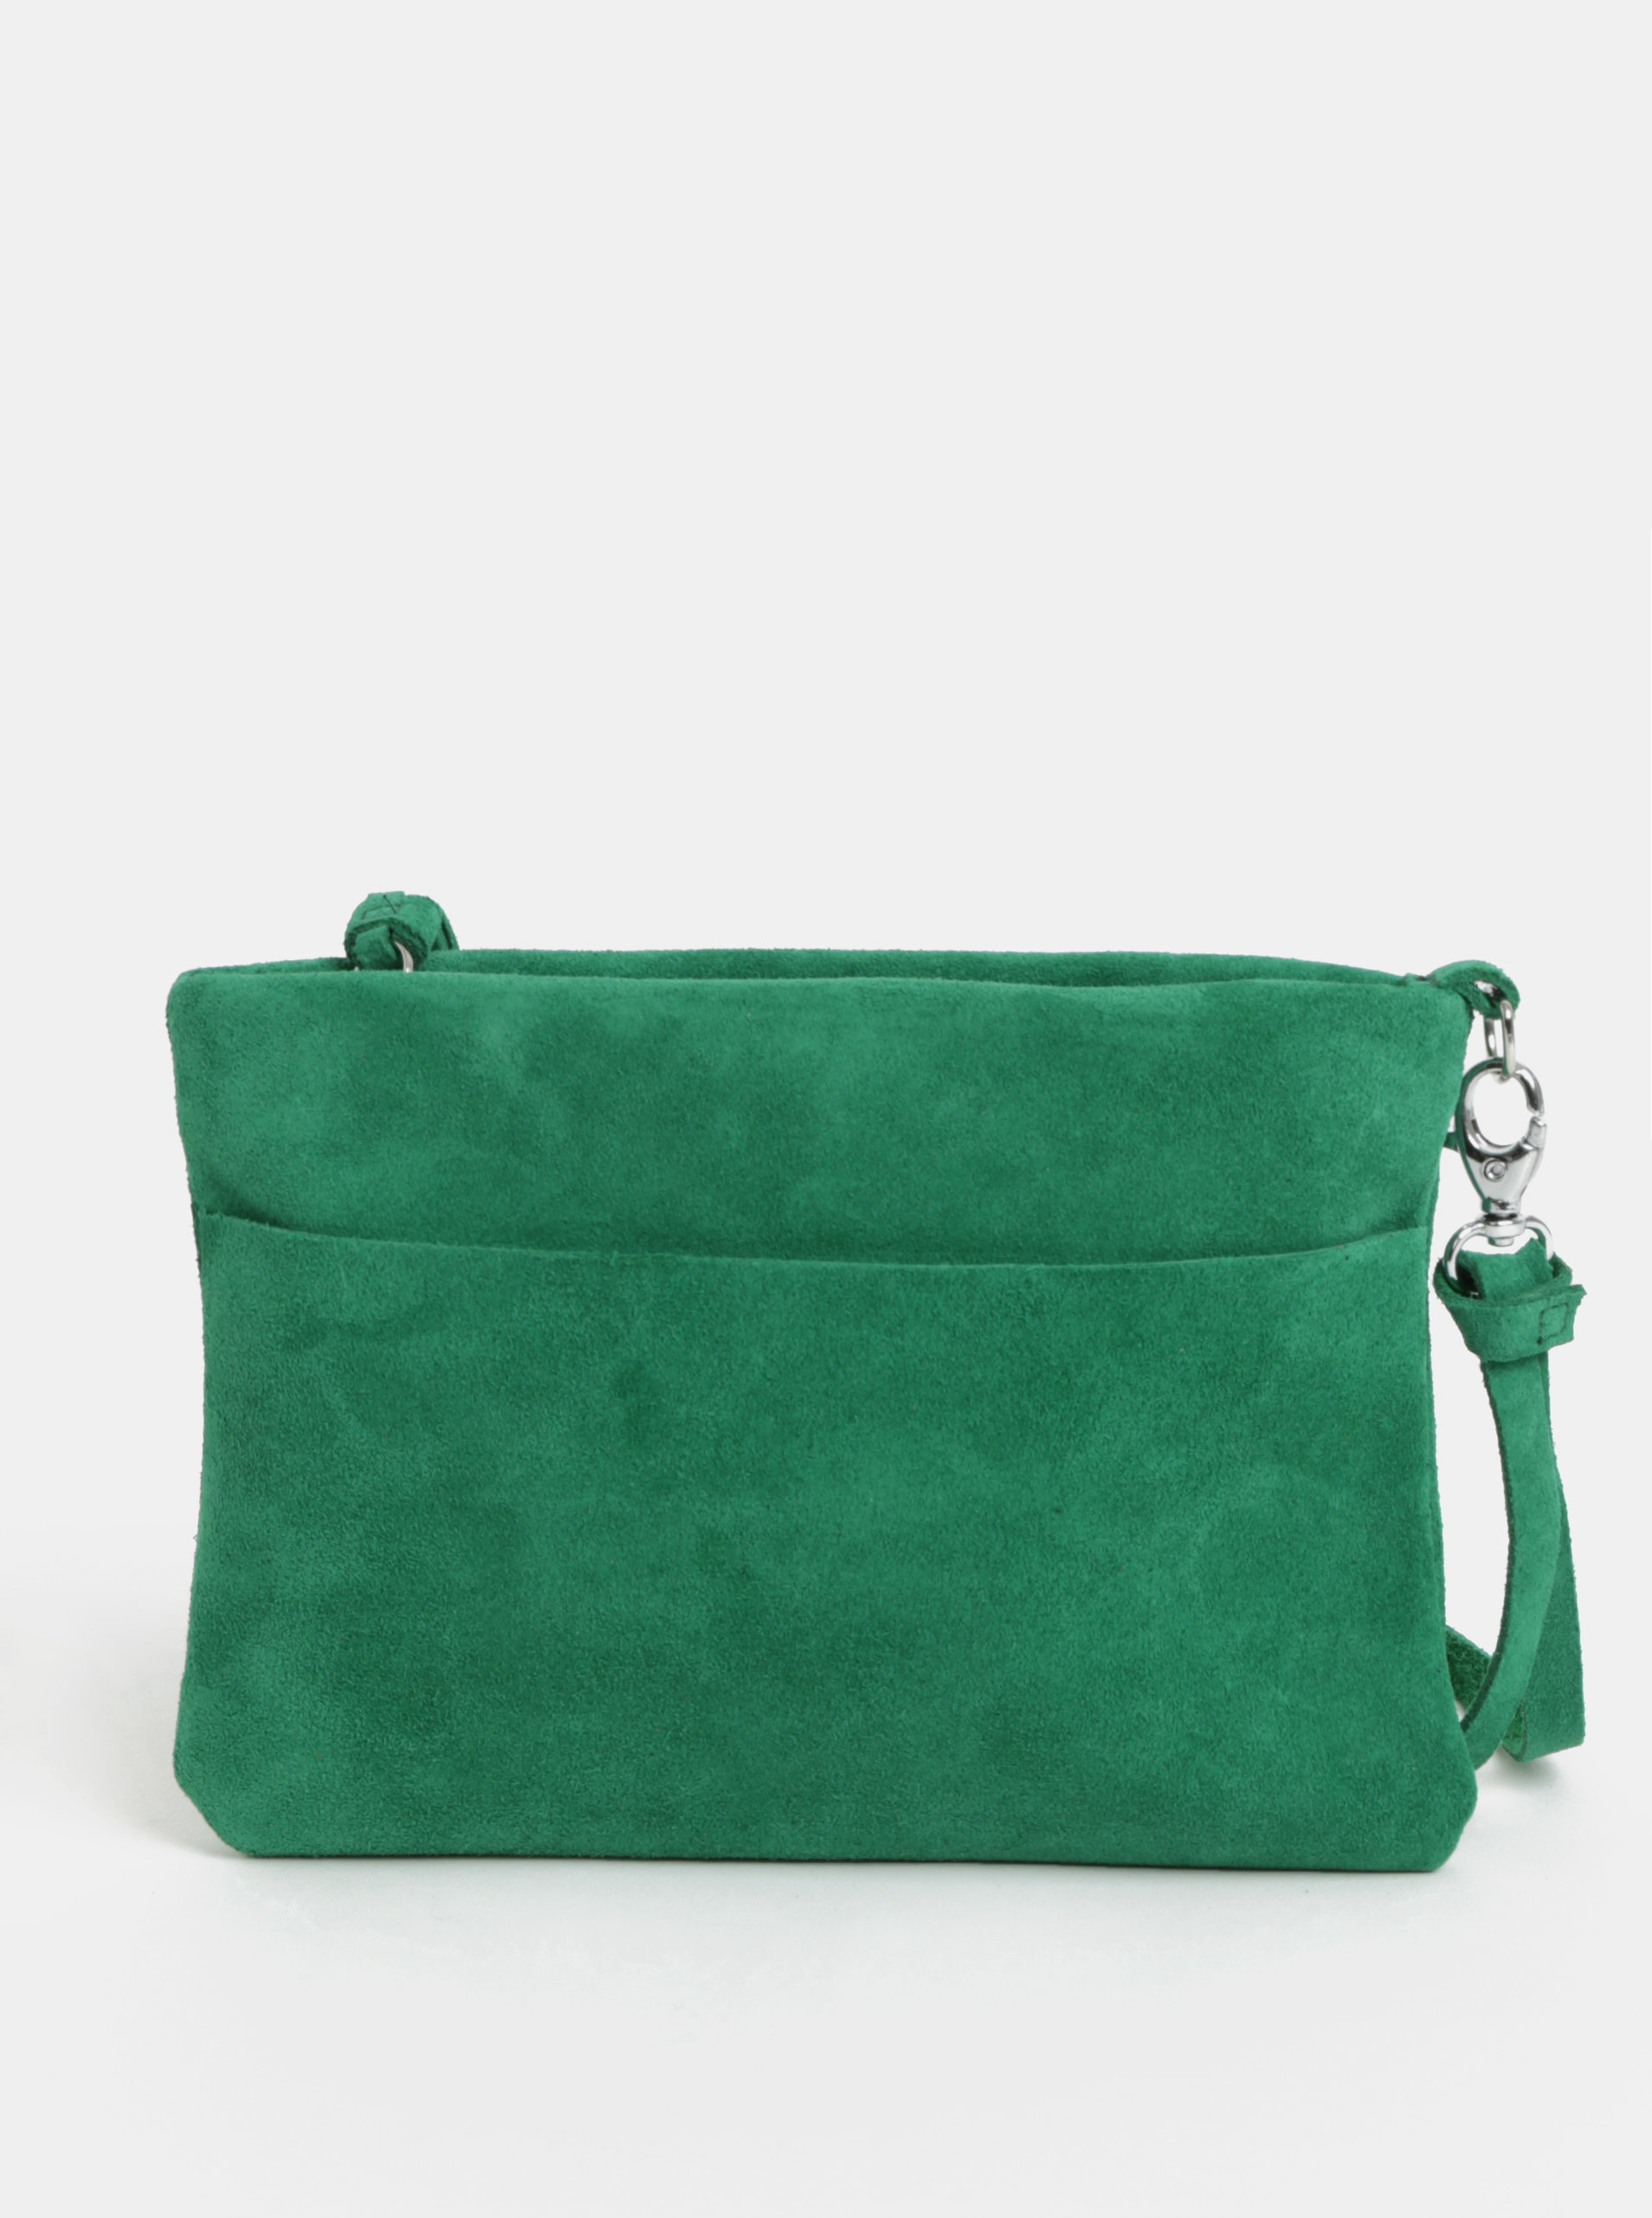 Zelená semišová listová kabelka so strapcom KOZAK Mia ... 1107d8228ca